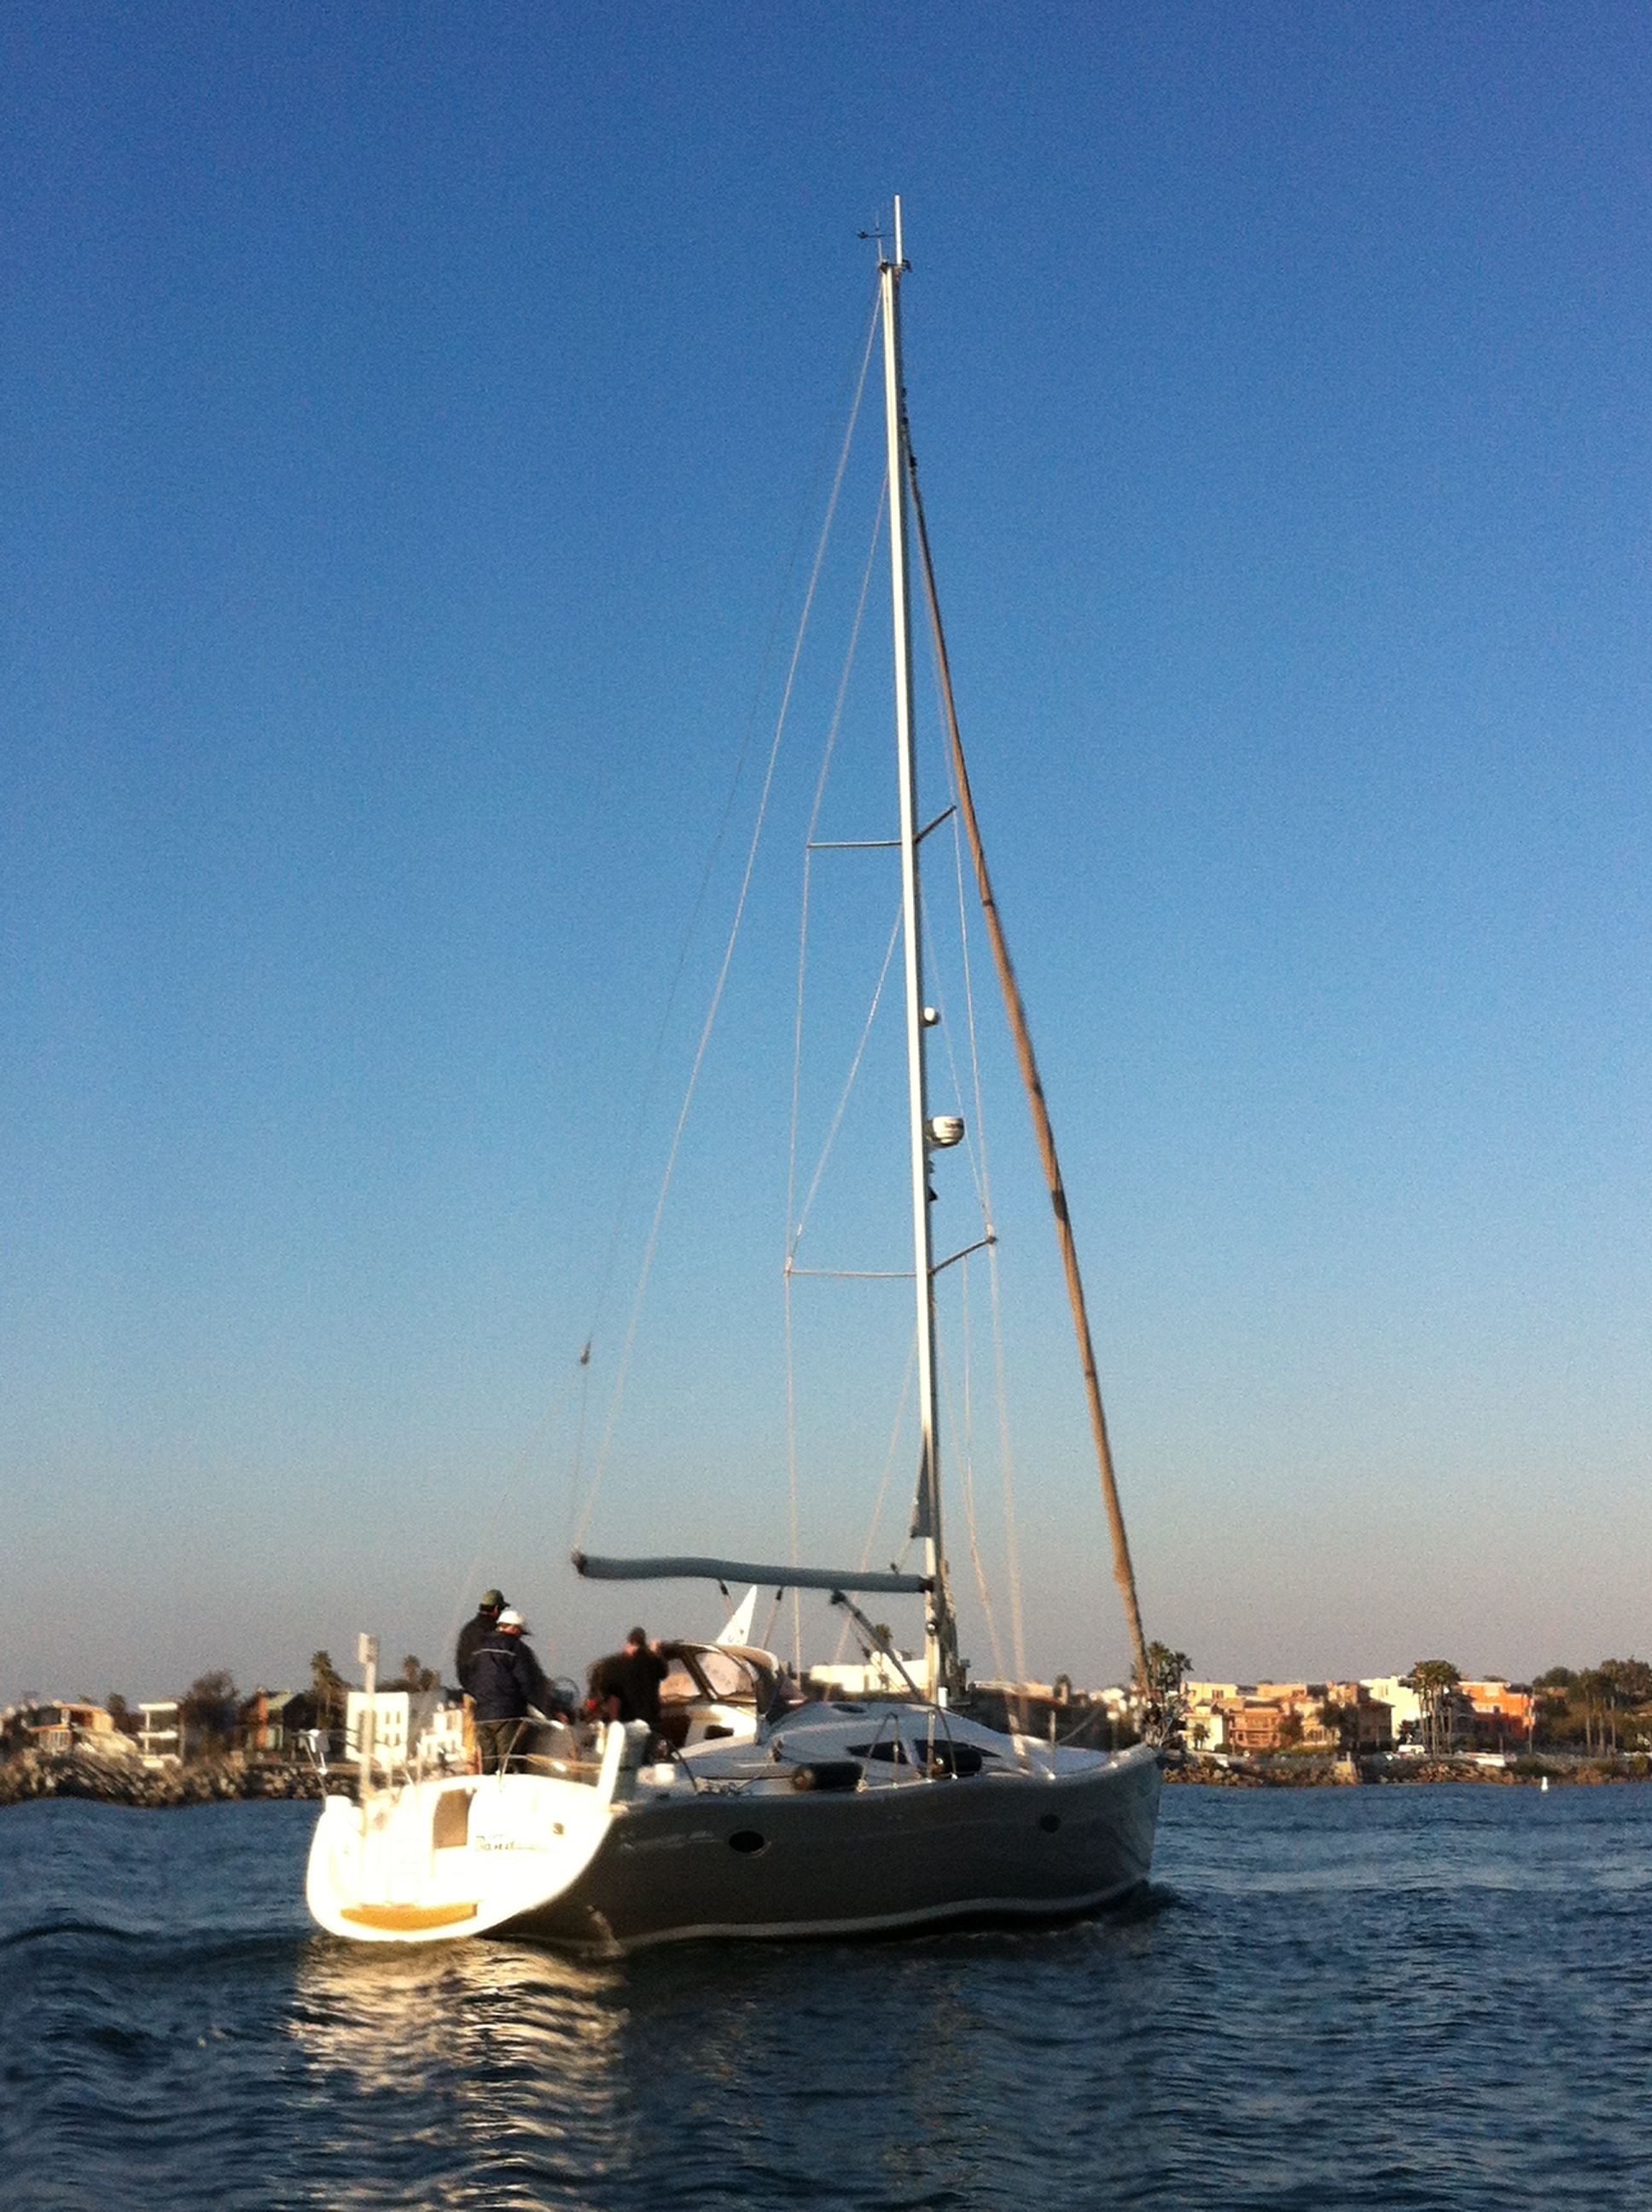 #MarinaDelRey #sailboat racers